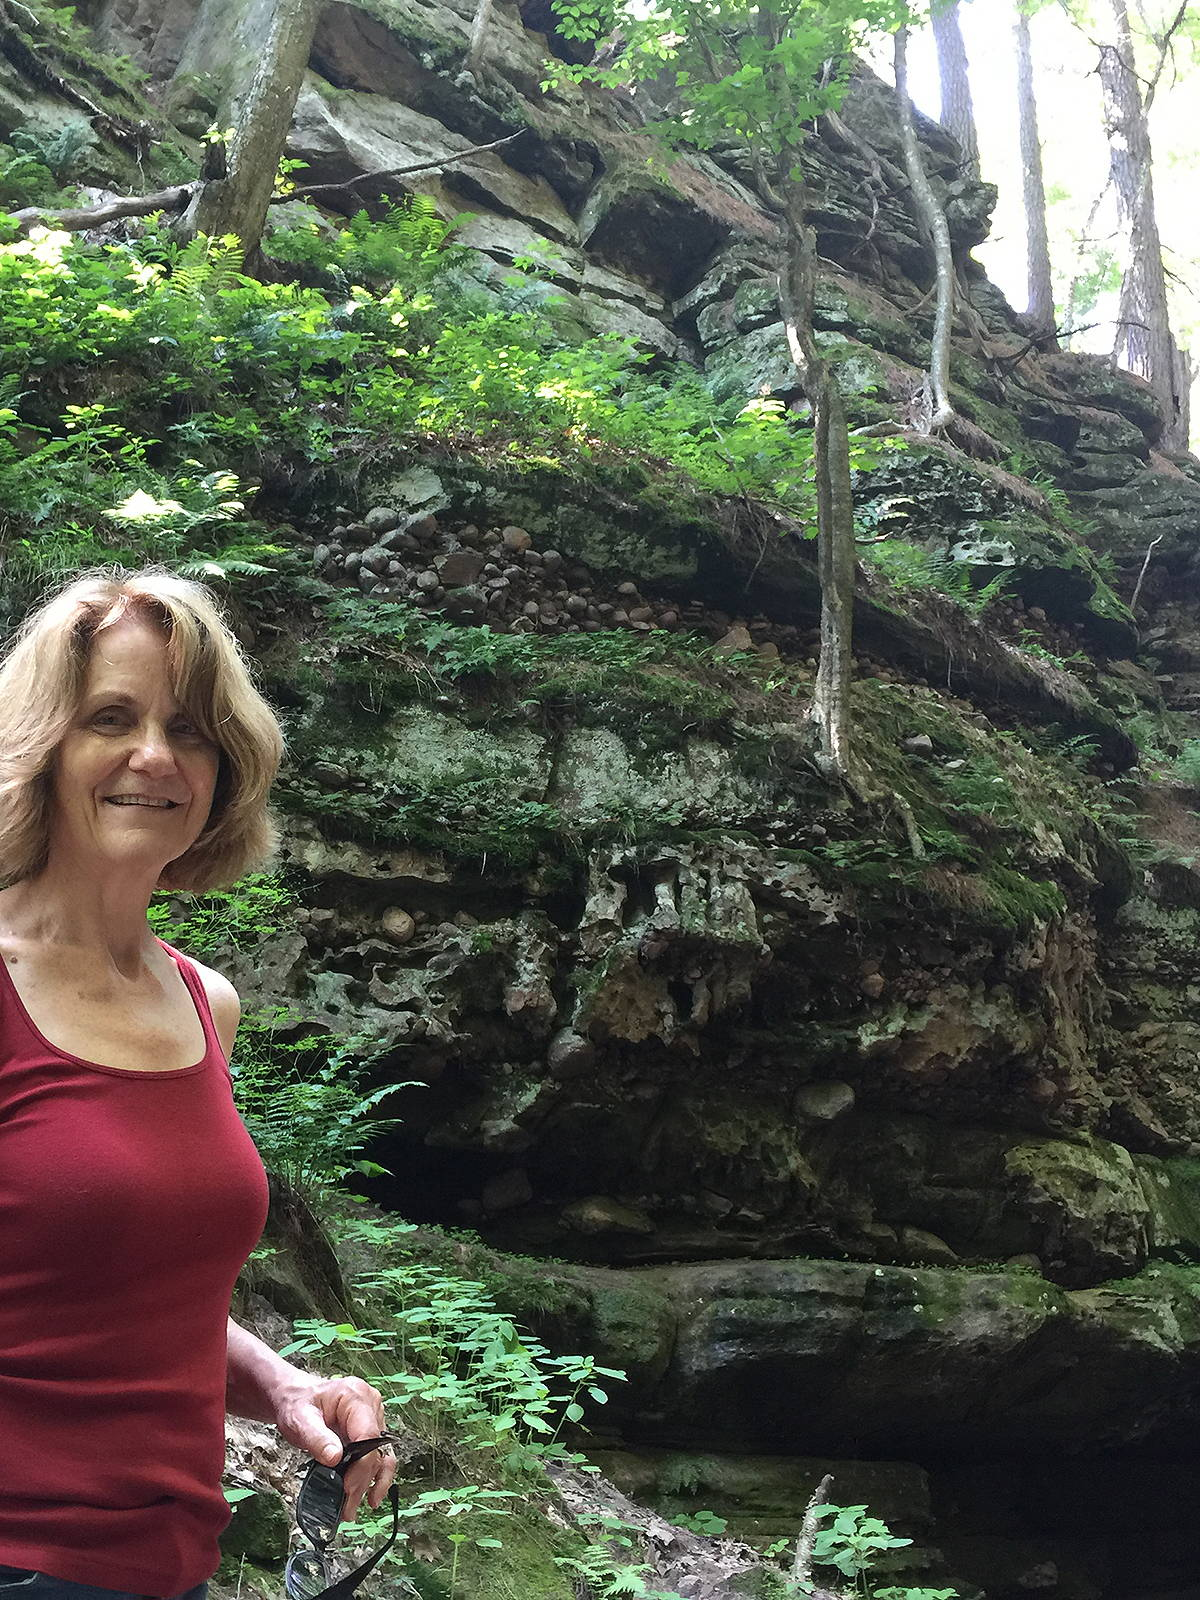 Robyn explores Parfrey's Glen near Baraboo, Wisconsin